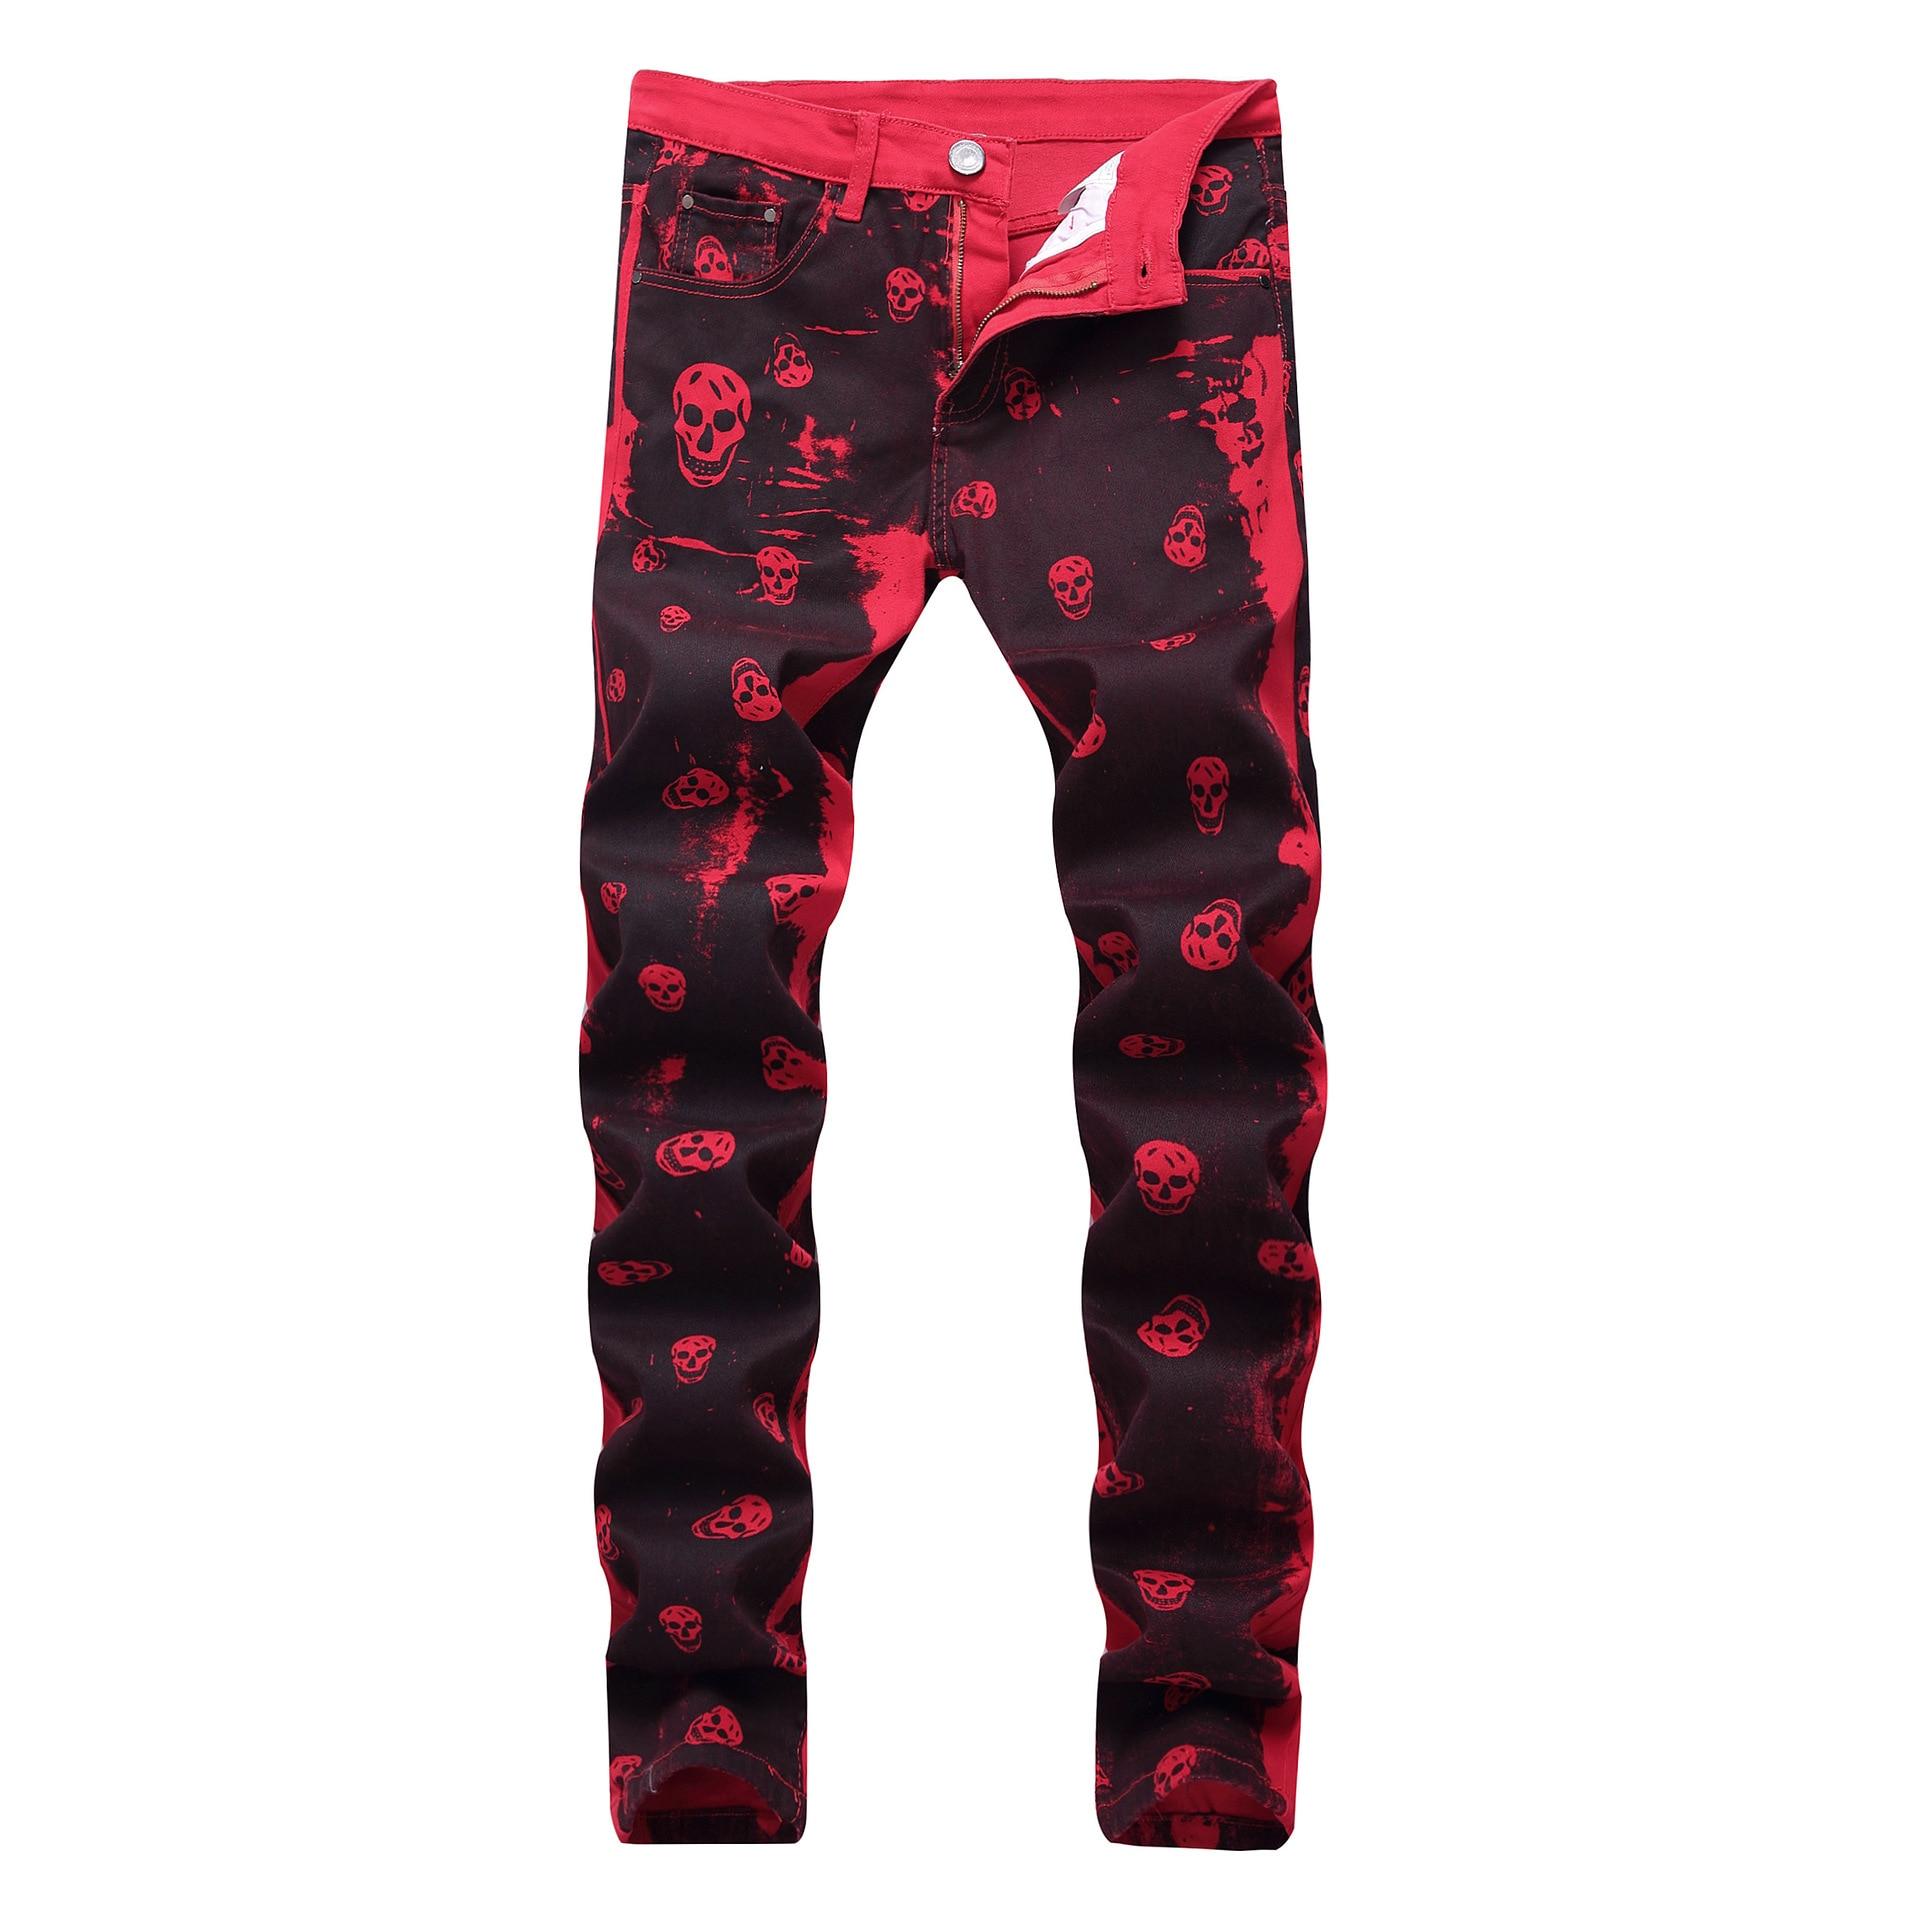 Lightweight Full Length Plaid Slim Medium Men Jeans Cross Printed Red Cotton Elastic Amazon Style Men's Trousers 2018 New